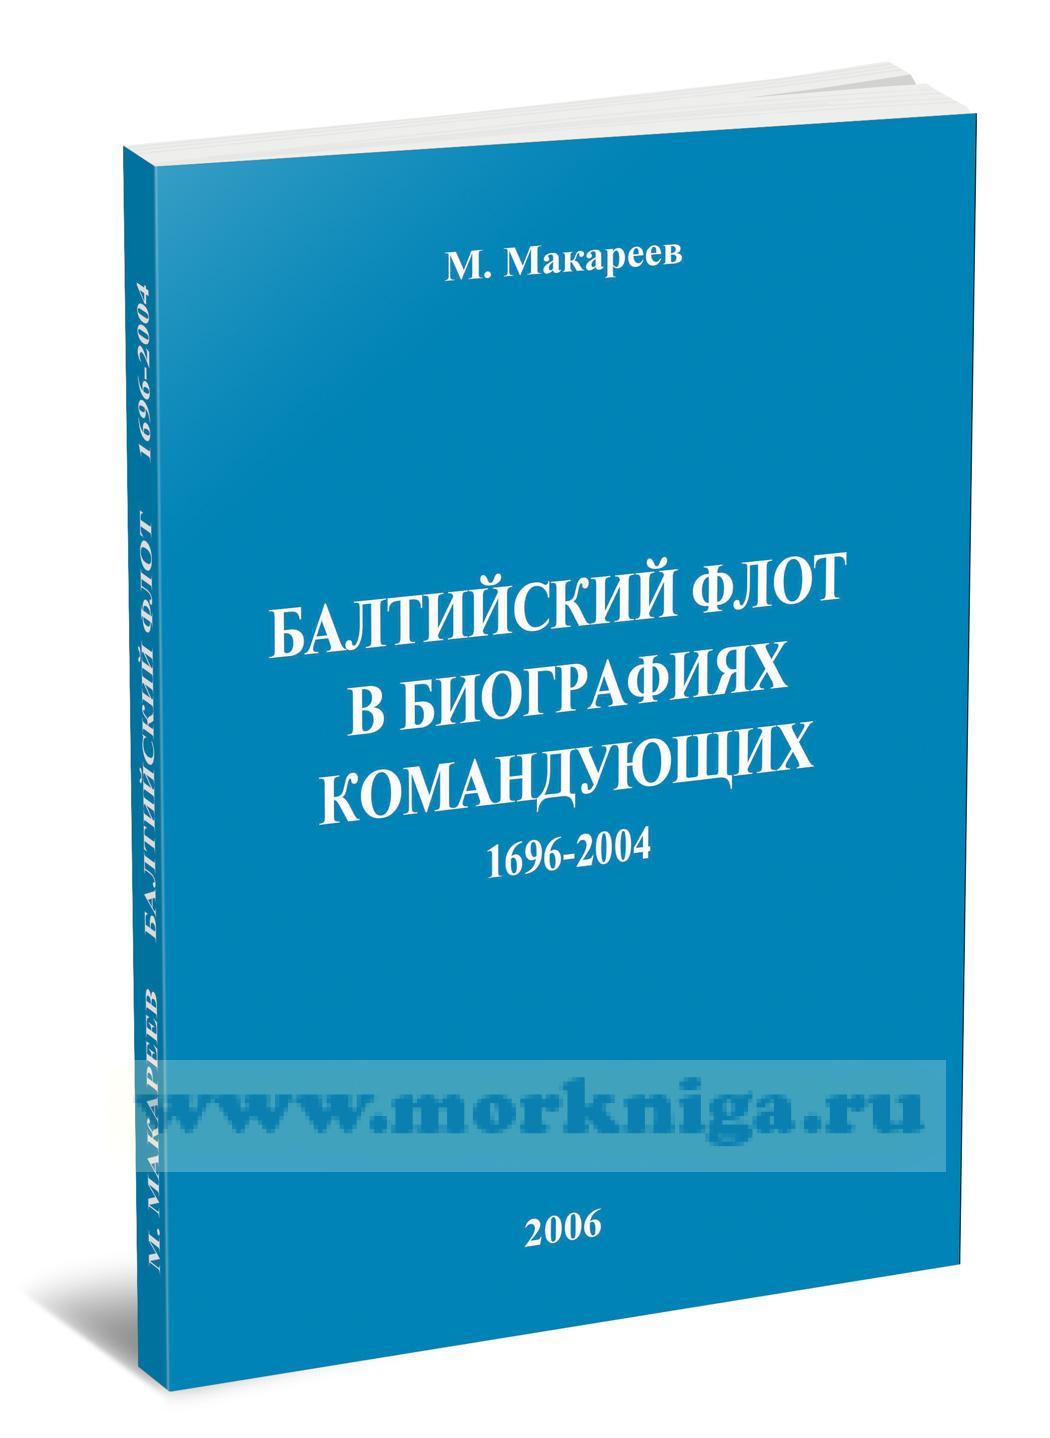 Балтийский флот в биографиях командующих 1696-2004